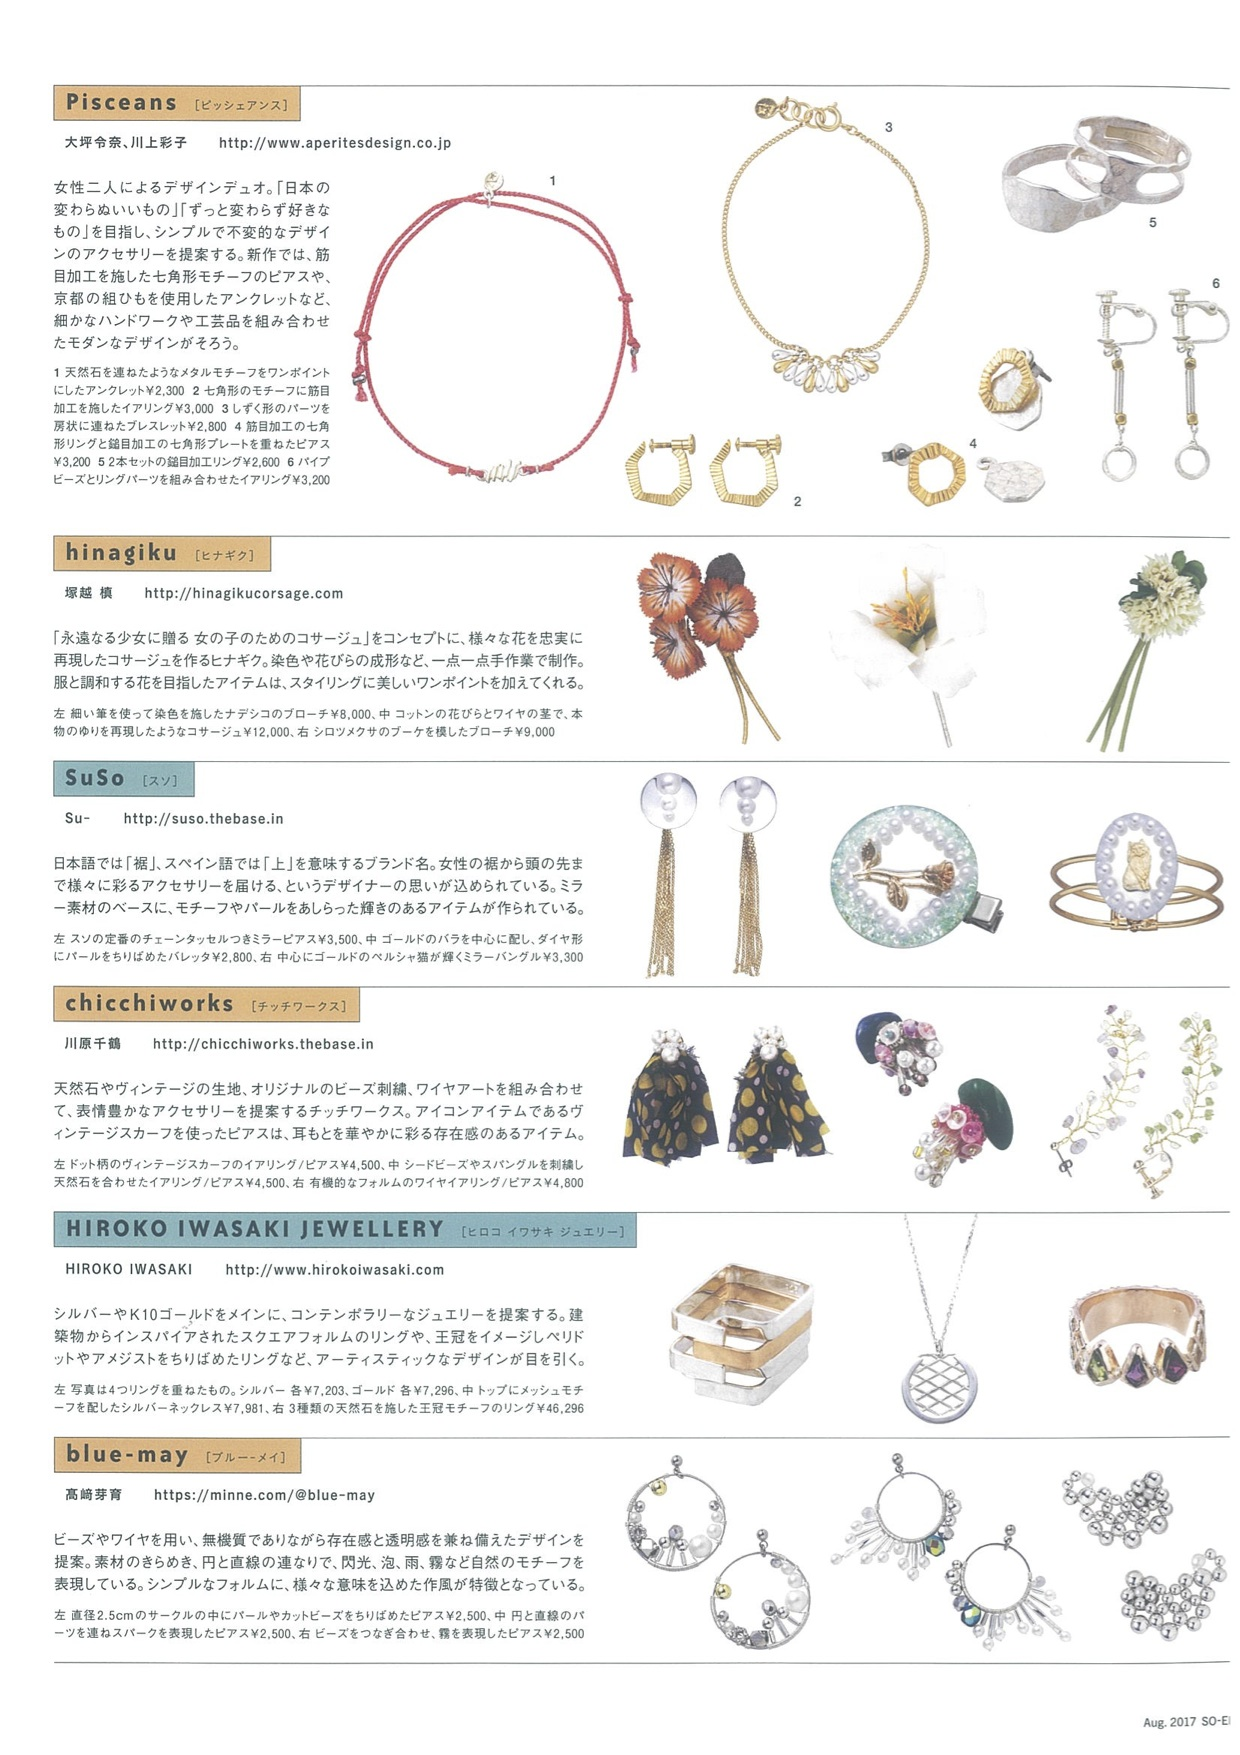 【Event Info】装苑-アクセサリー蚤の市 7/8(Sat)、9(Sun)展示販売